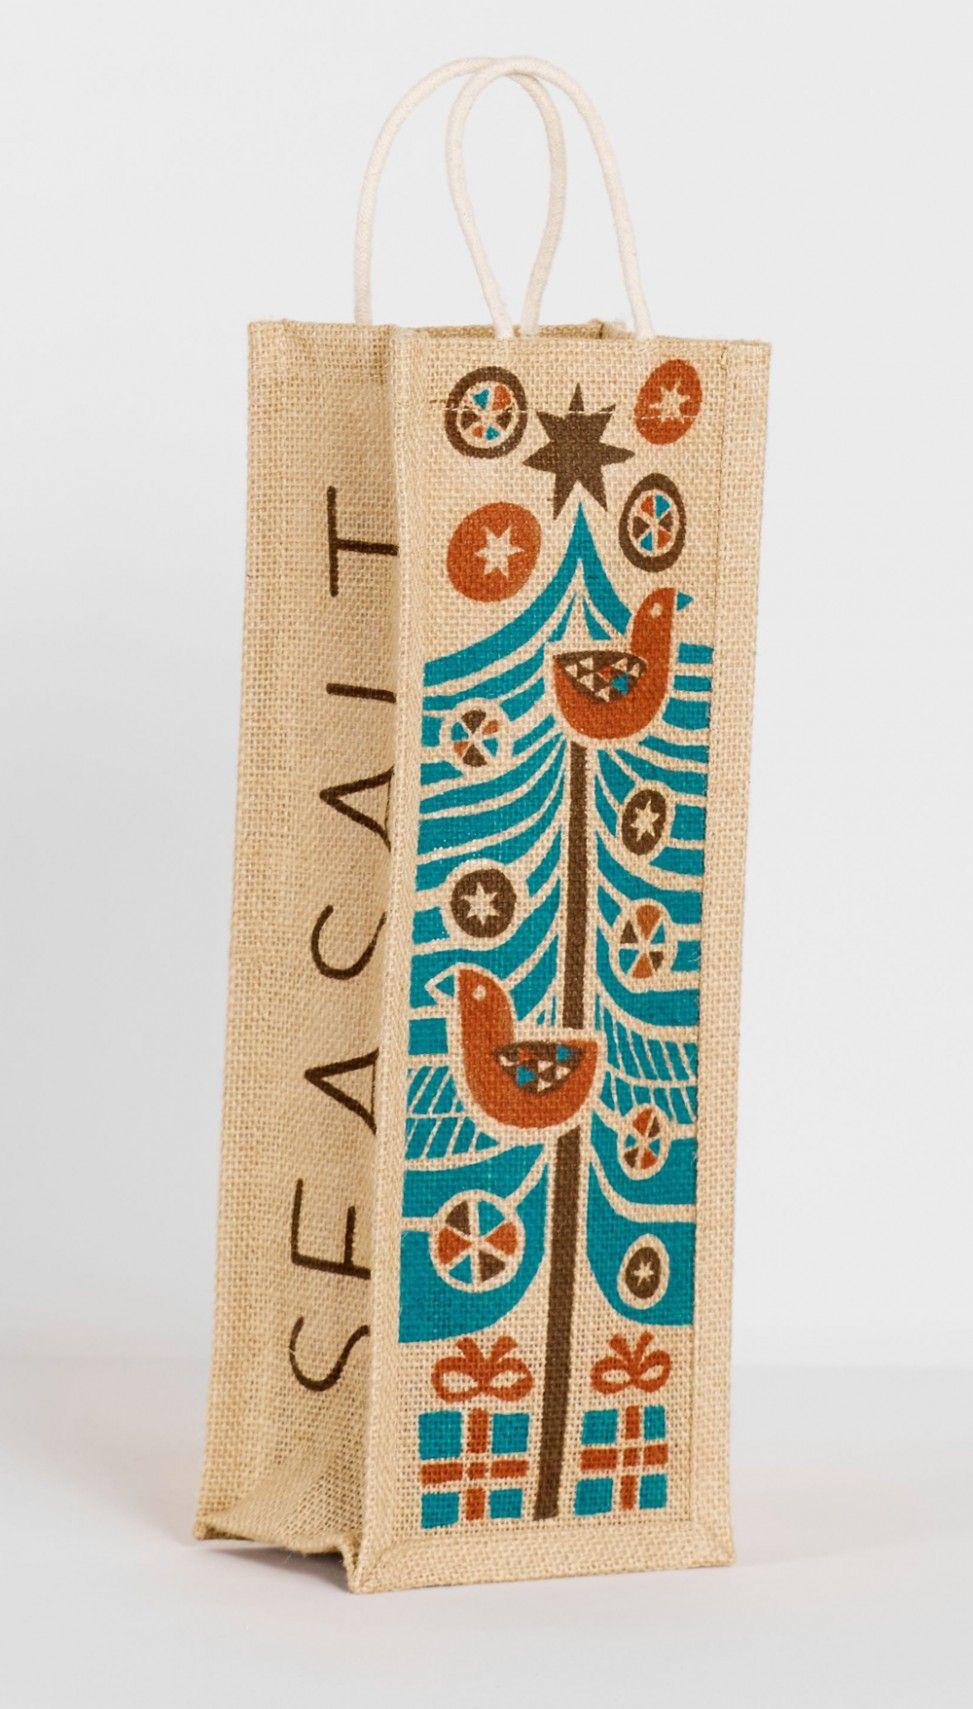 Download Wine Bottle Jute Bag With Folk Art Skandi Style Christmas Tree Print By Matt Kohnson For Seasalt Cornwall Christmas Robin Jut Jute Bags Printed Bags Tree Print